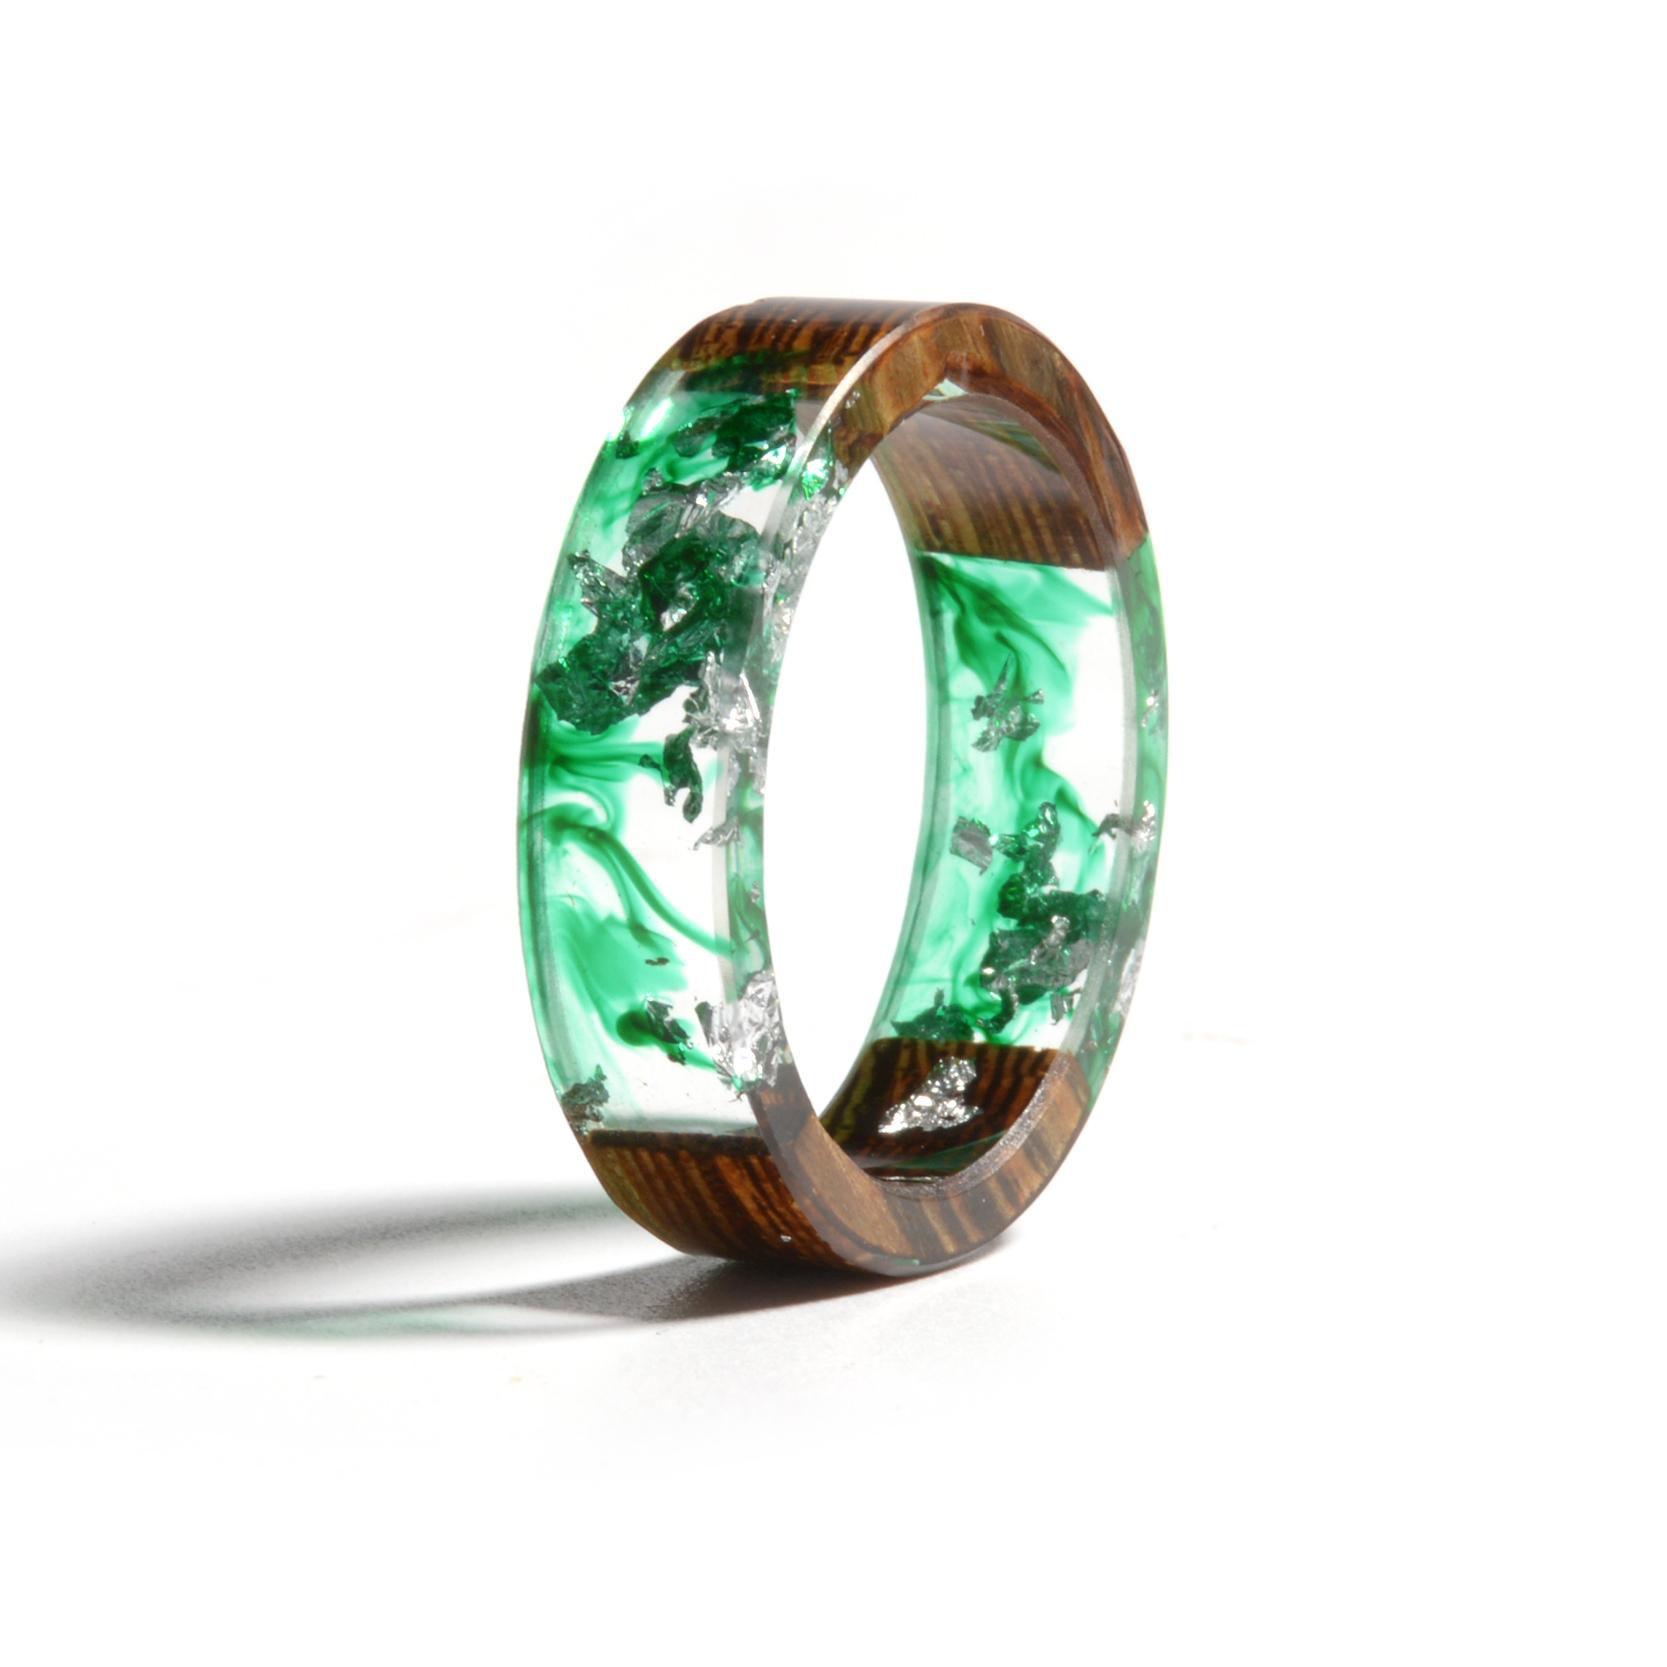 Clear Wood Resin Ring Handmade Dried Flower Hand Jewellery 16